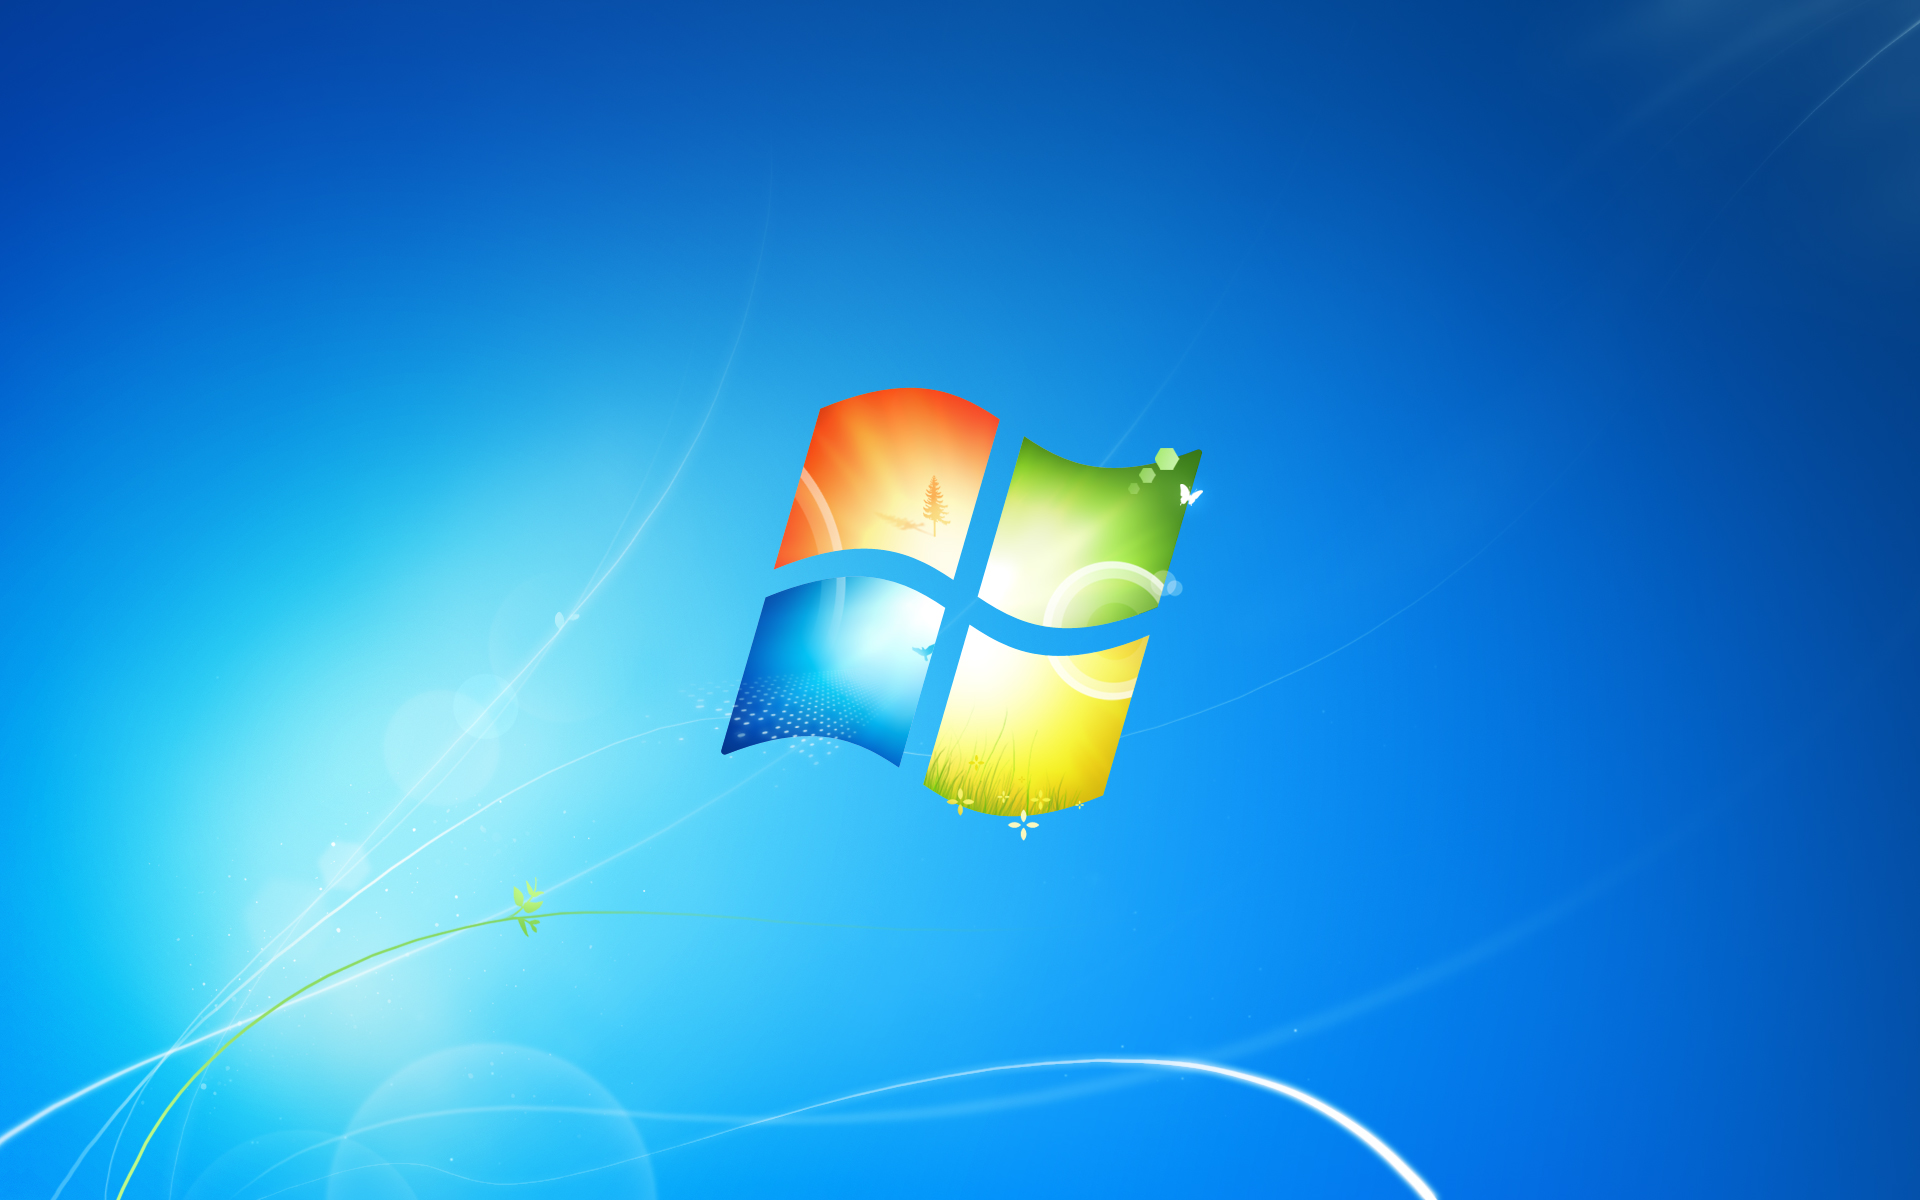 Windows 7 RTM Default Wallpaper the Design Story   Softpedia 1920x1200